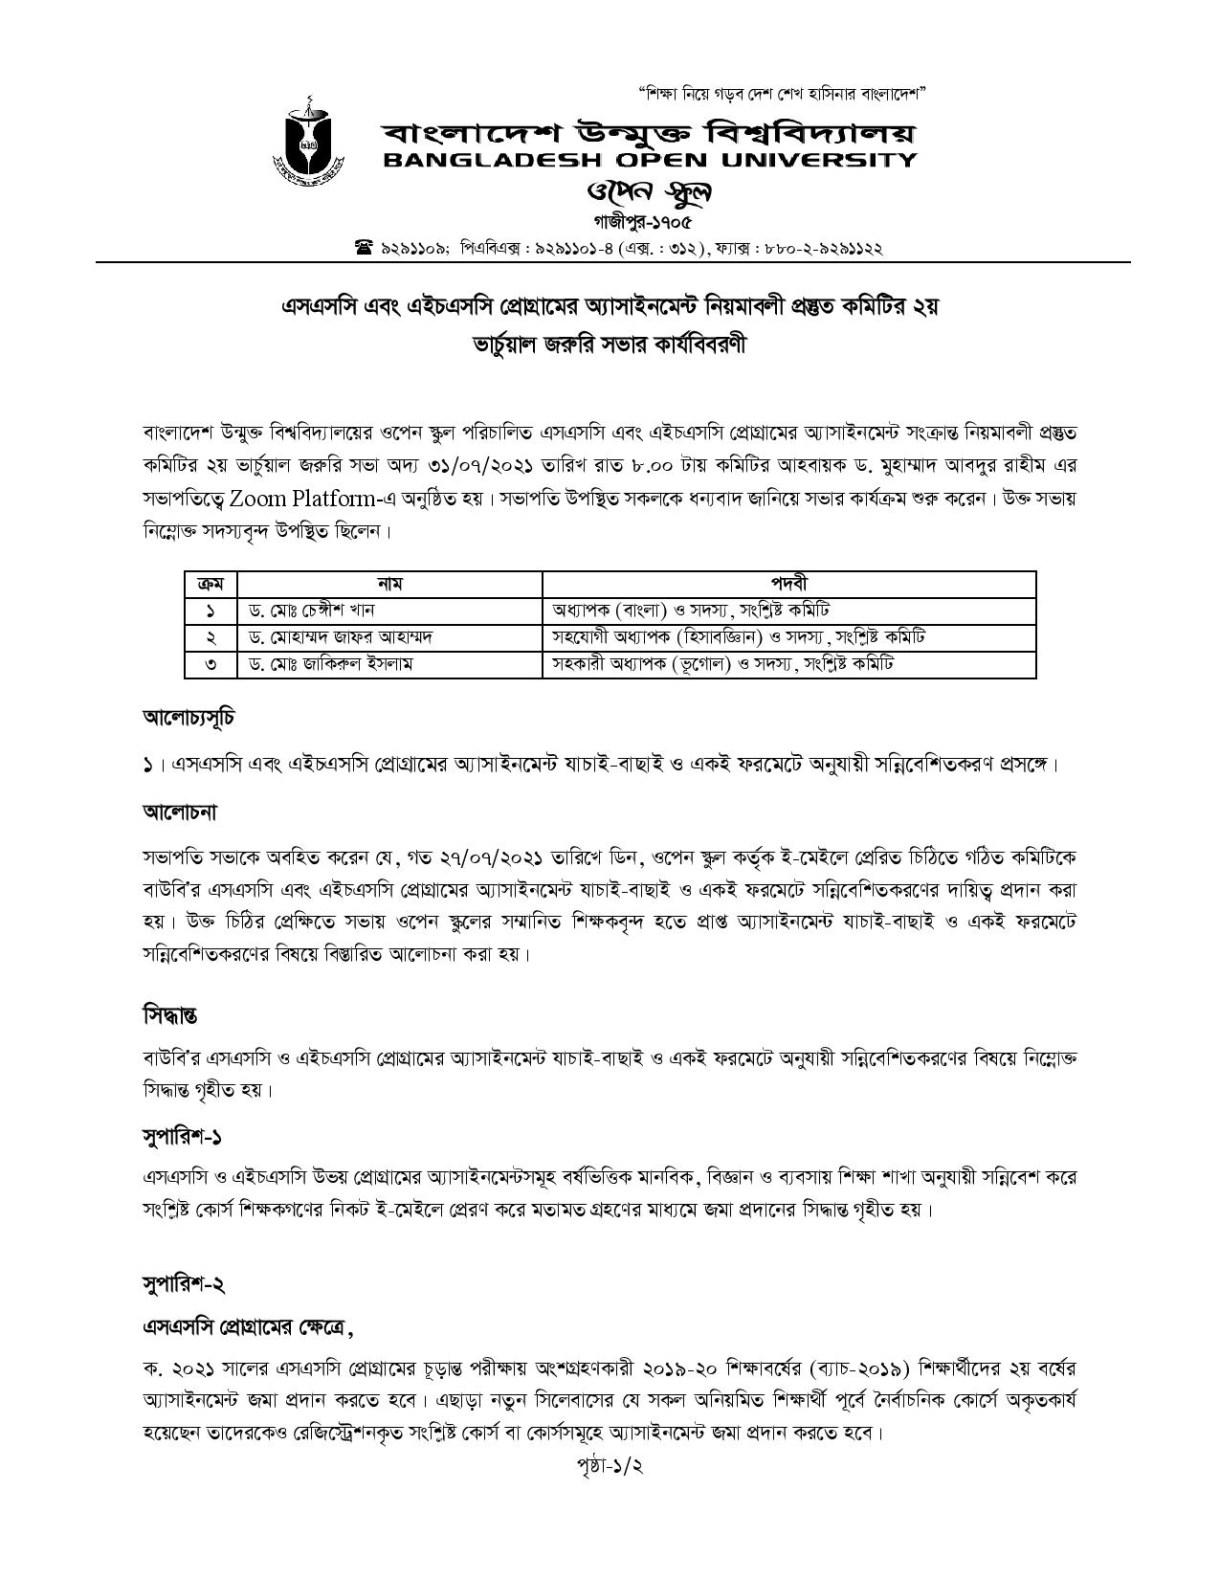 Bangladesh Open University BOU HSC Assignment Answer 2021 Pdf Download 29